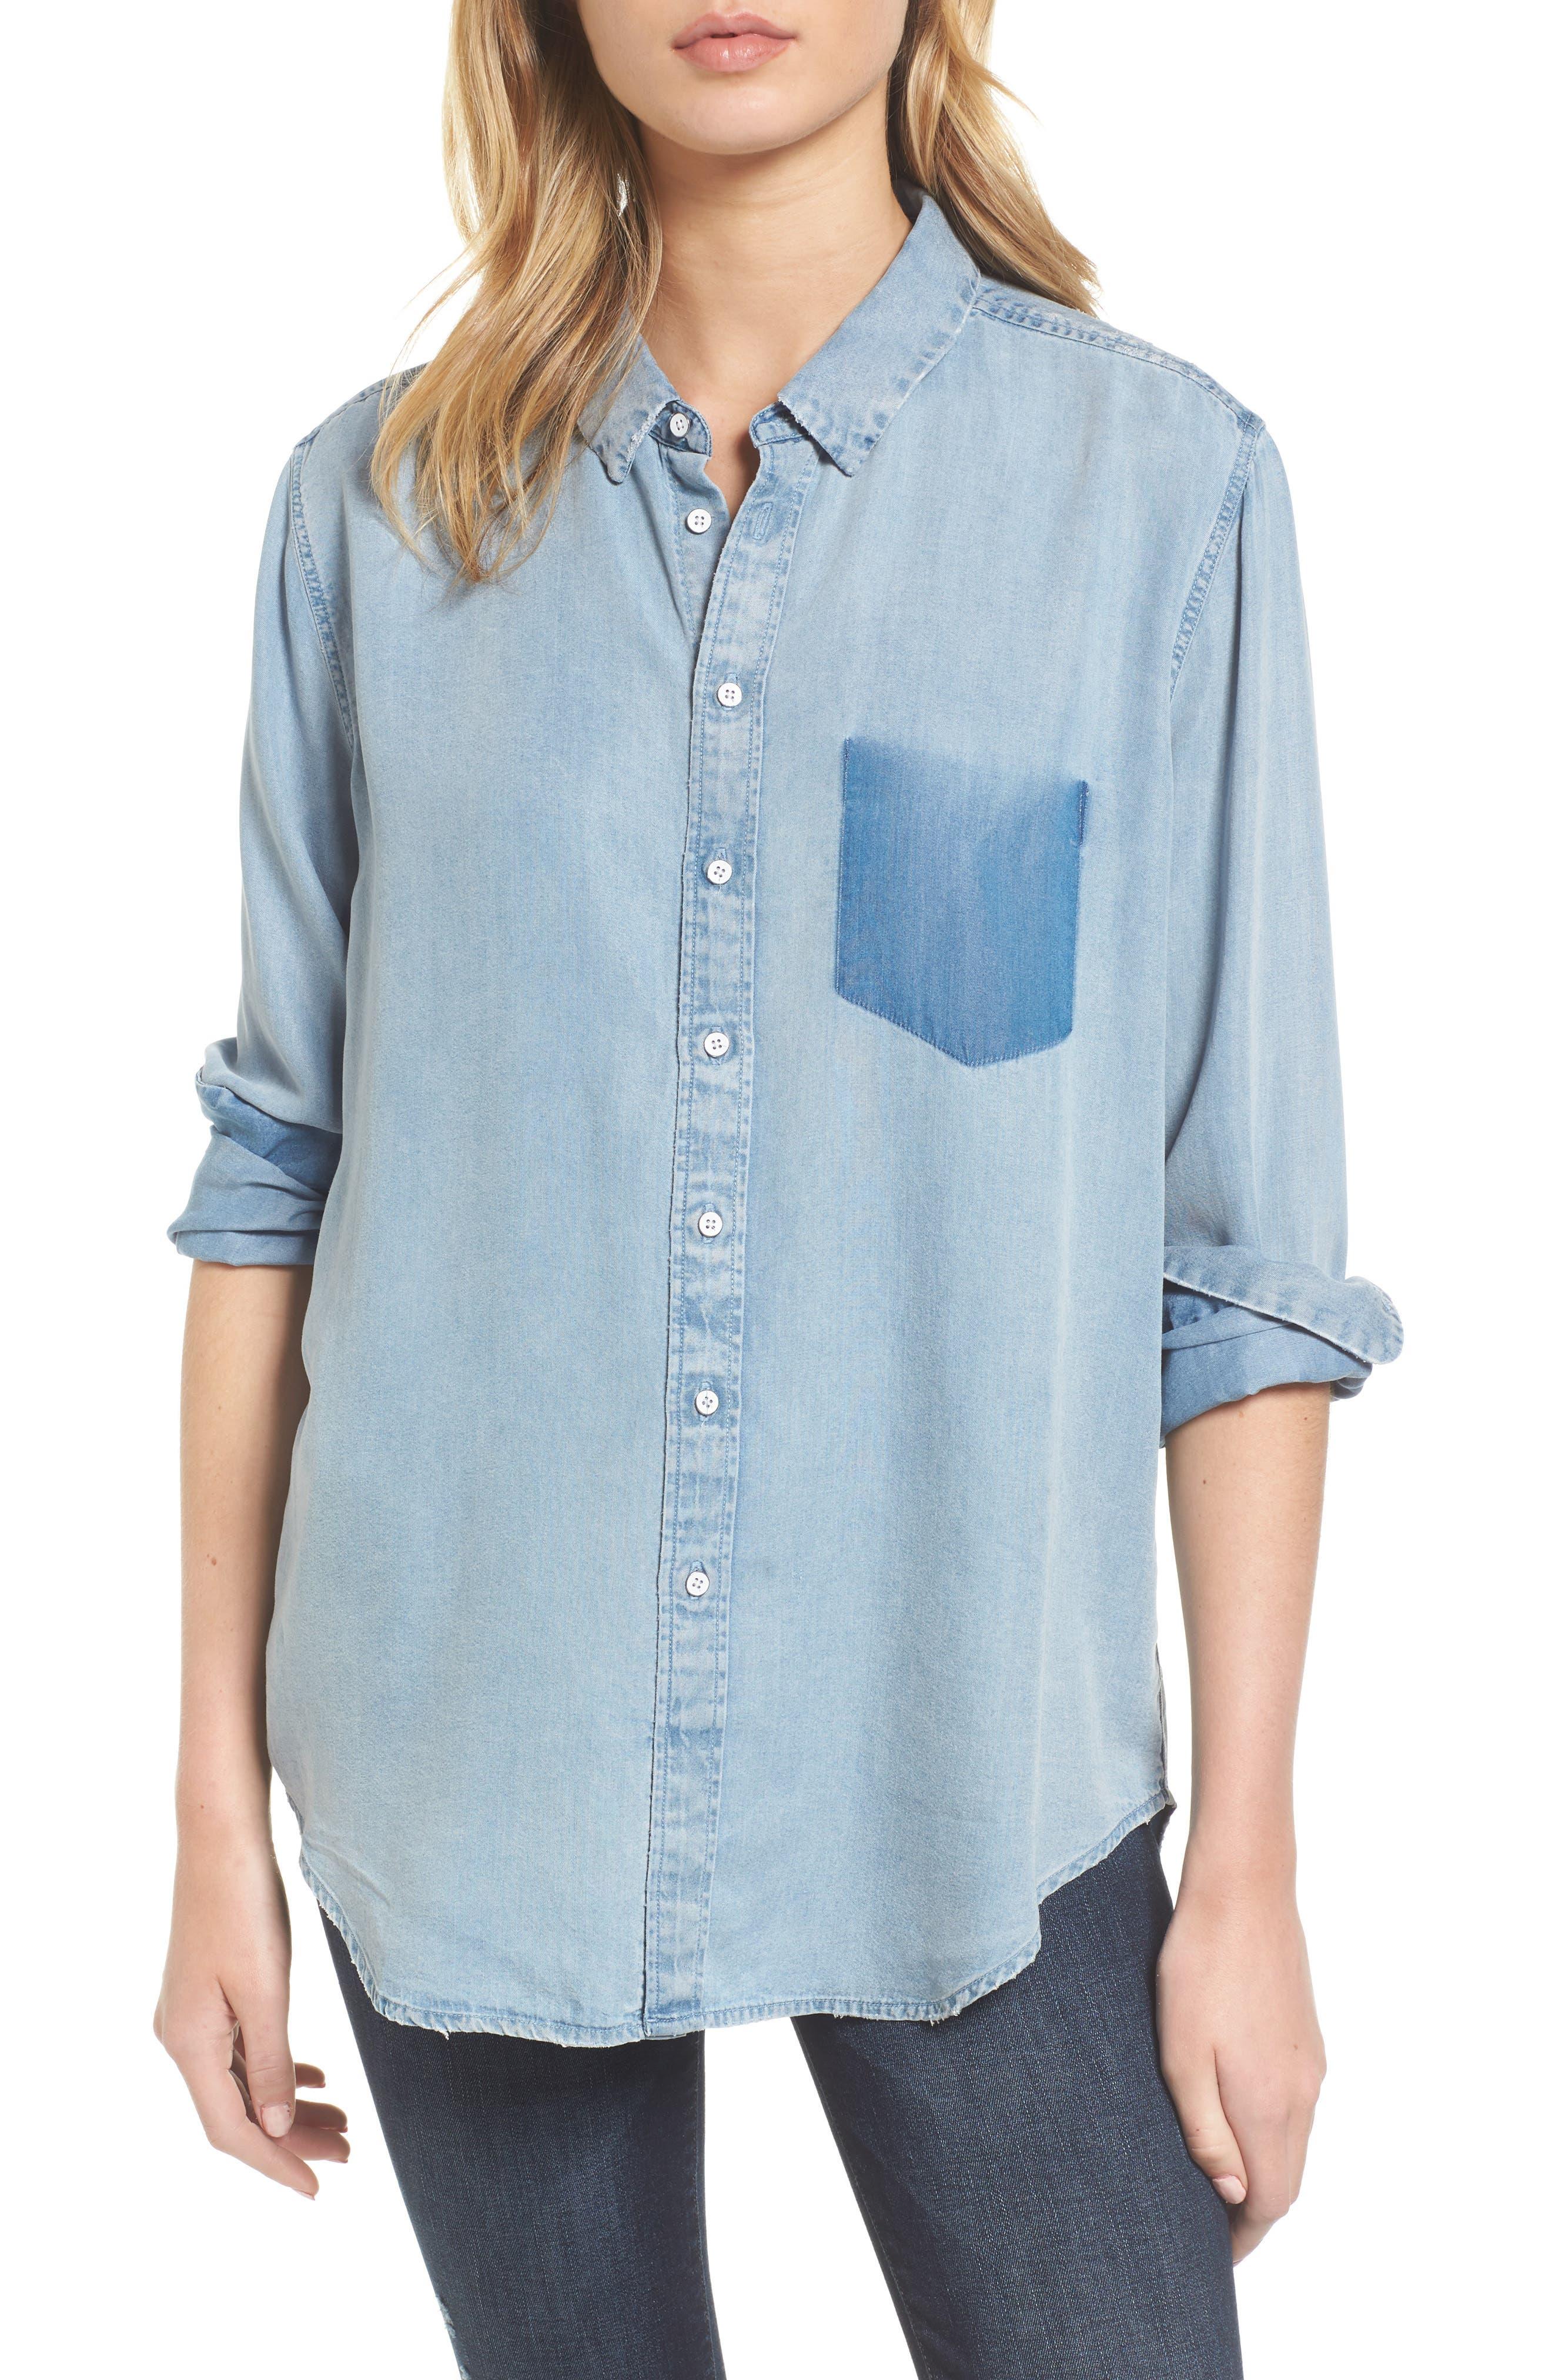 Main Image - DL1961 x The Blue Shirt Shop Nassau & Manhattan Boyfriend Shirt